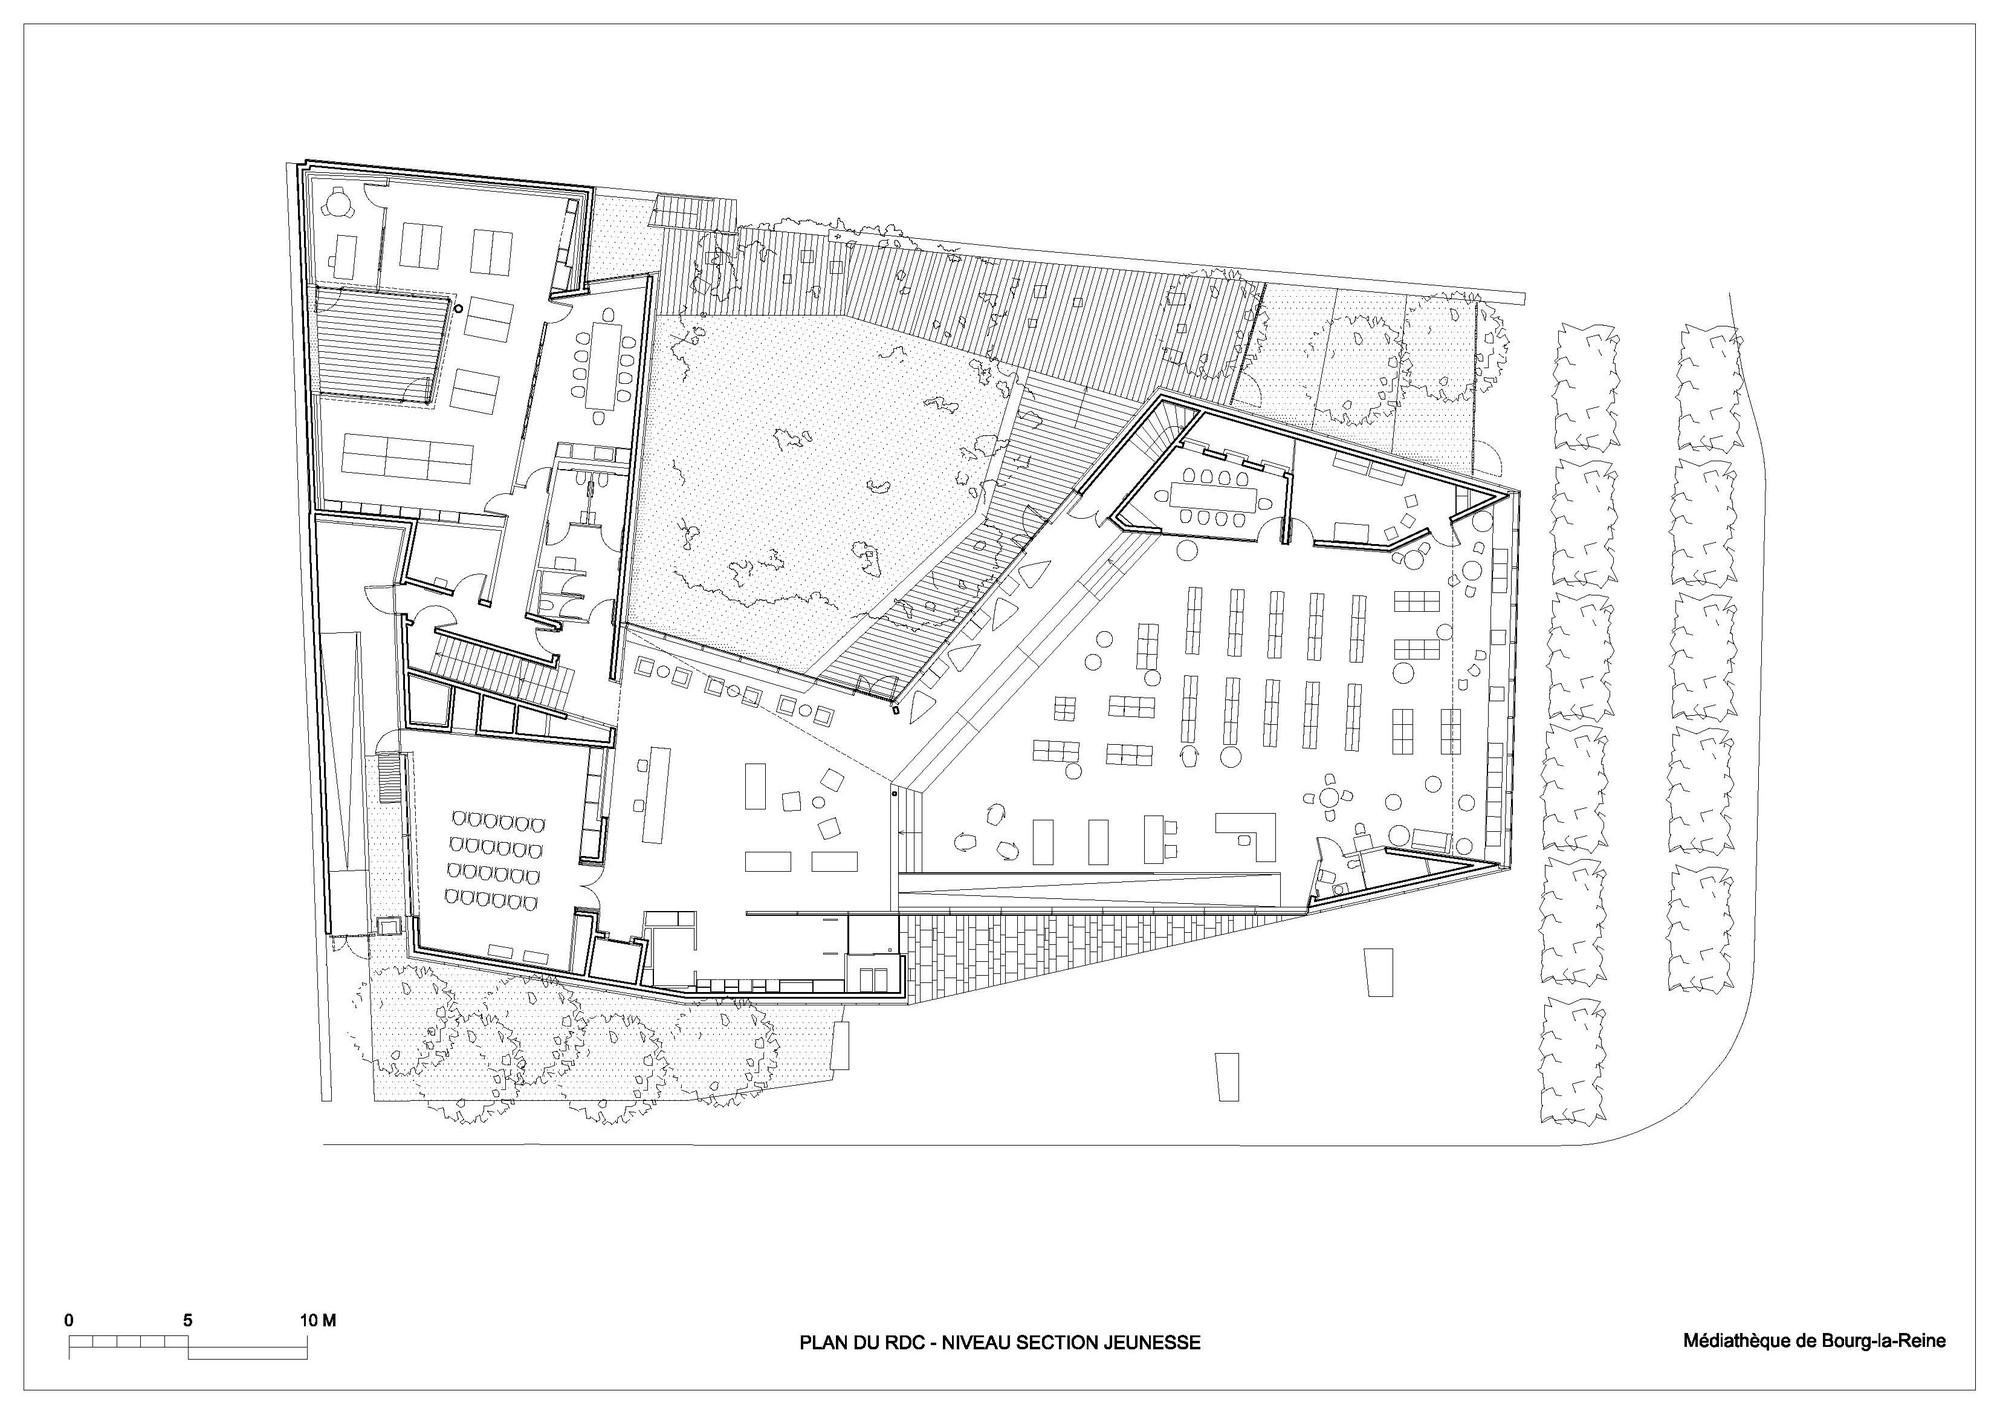 galeria de midiateca em bourg la reine pascale gu dot architecte 17. Black Bedroom Furniture Sets. Home Design Ideas